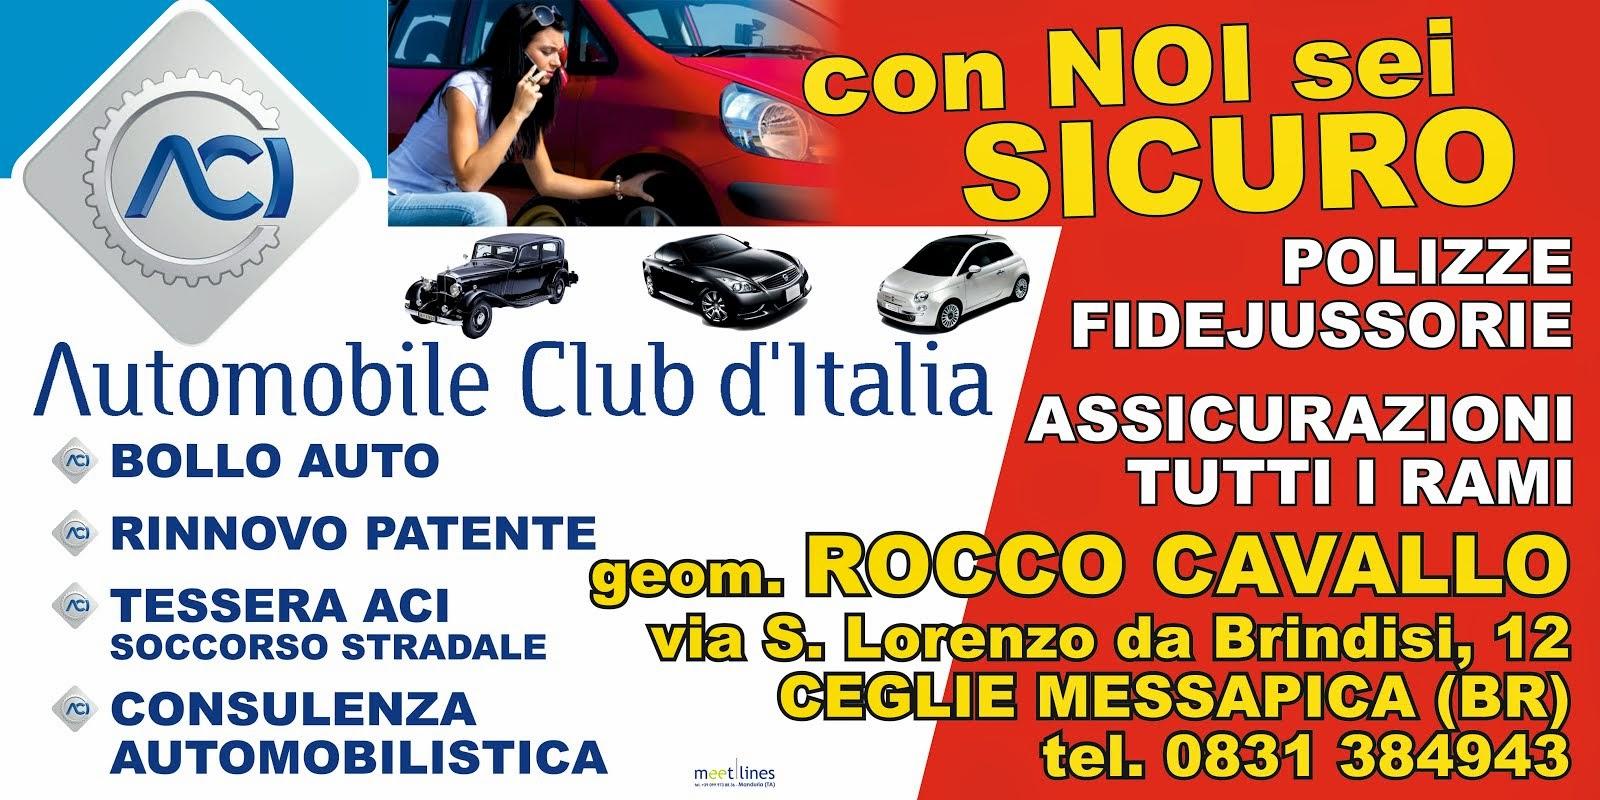 AUTOMOBIL CLUB ITALIA